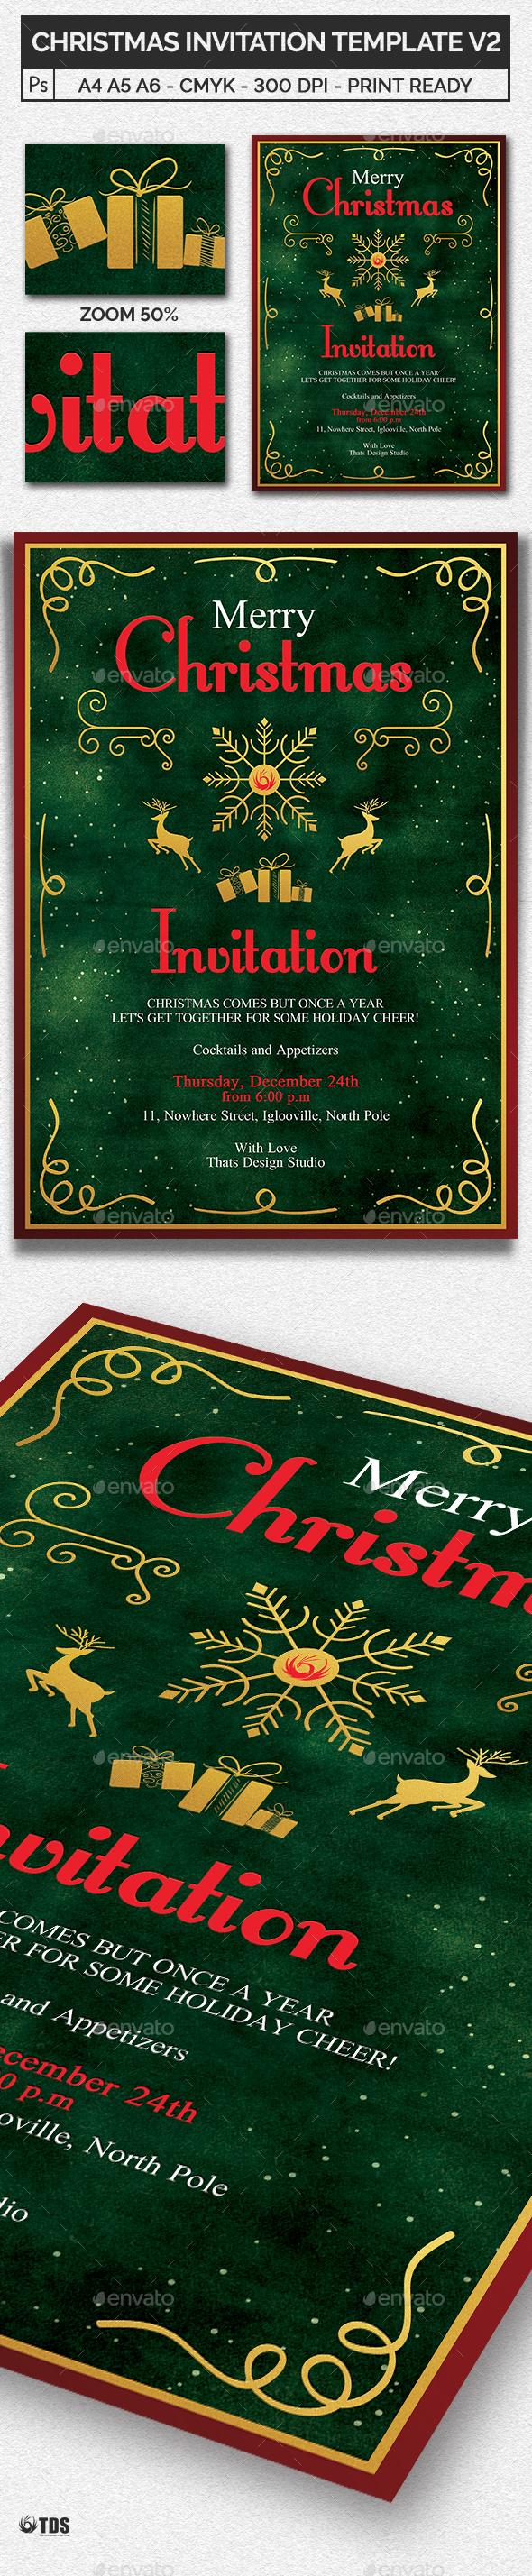 Christmas Invitation Template V2 - Invitations Cards & Invites